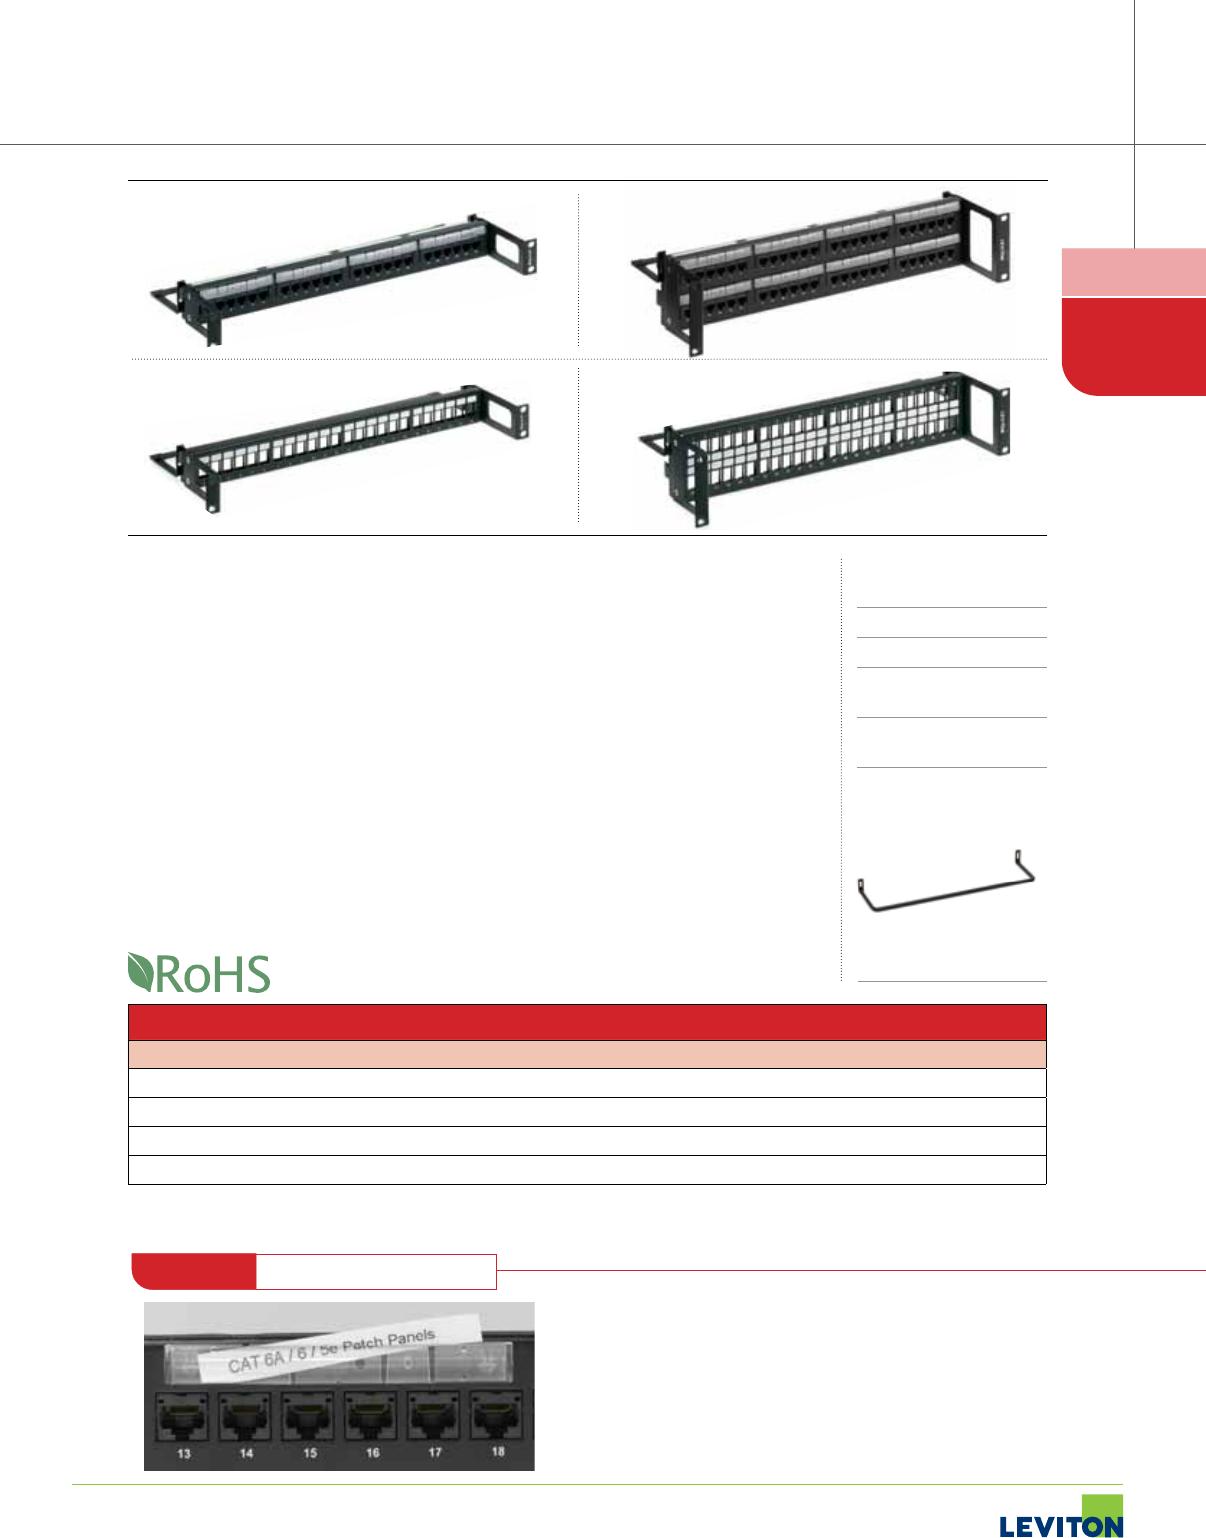 1000491716 Catalog 73 Cat6 Patch Panel 110 Type 24 Port 568a B Compatible